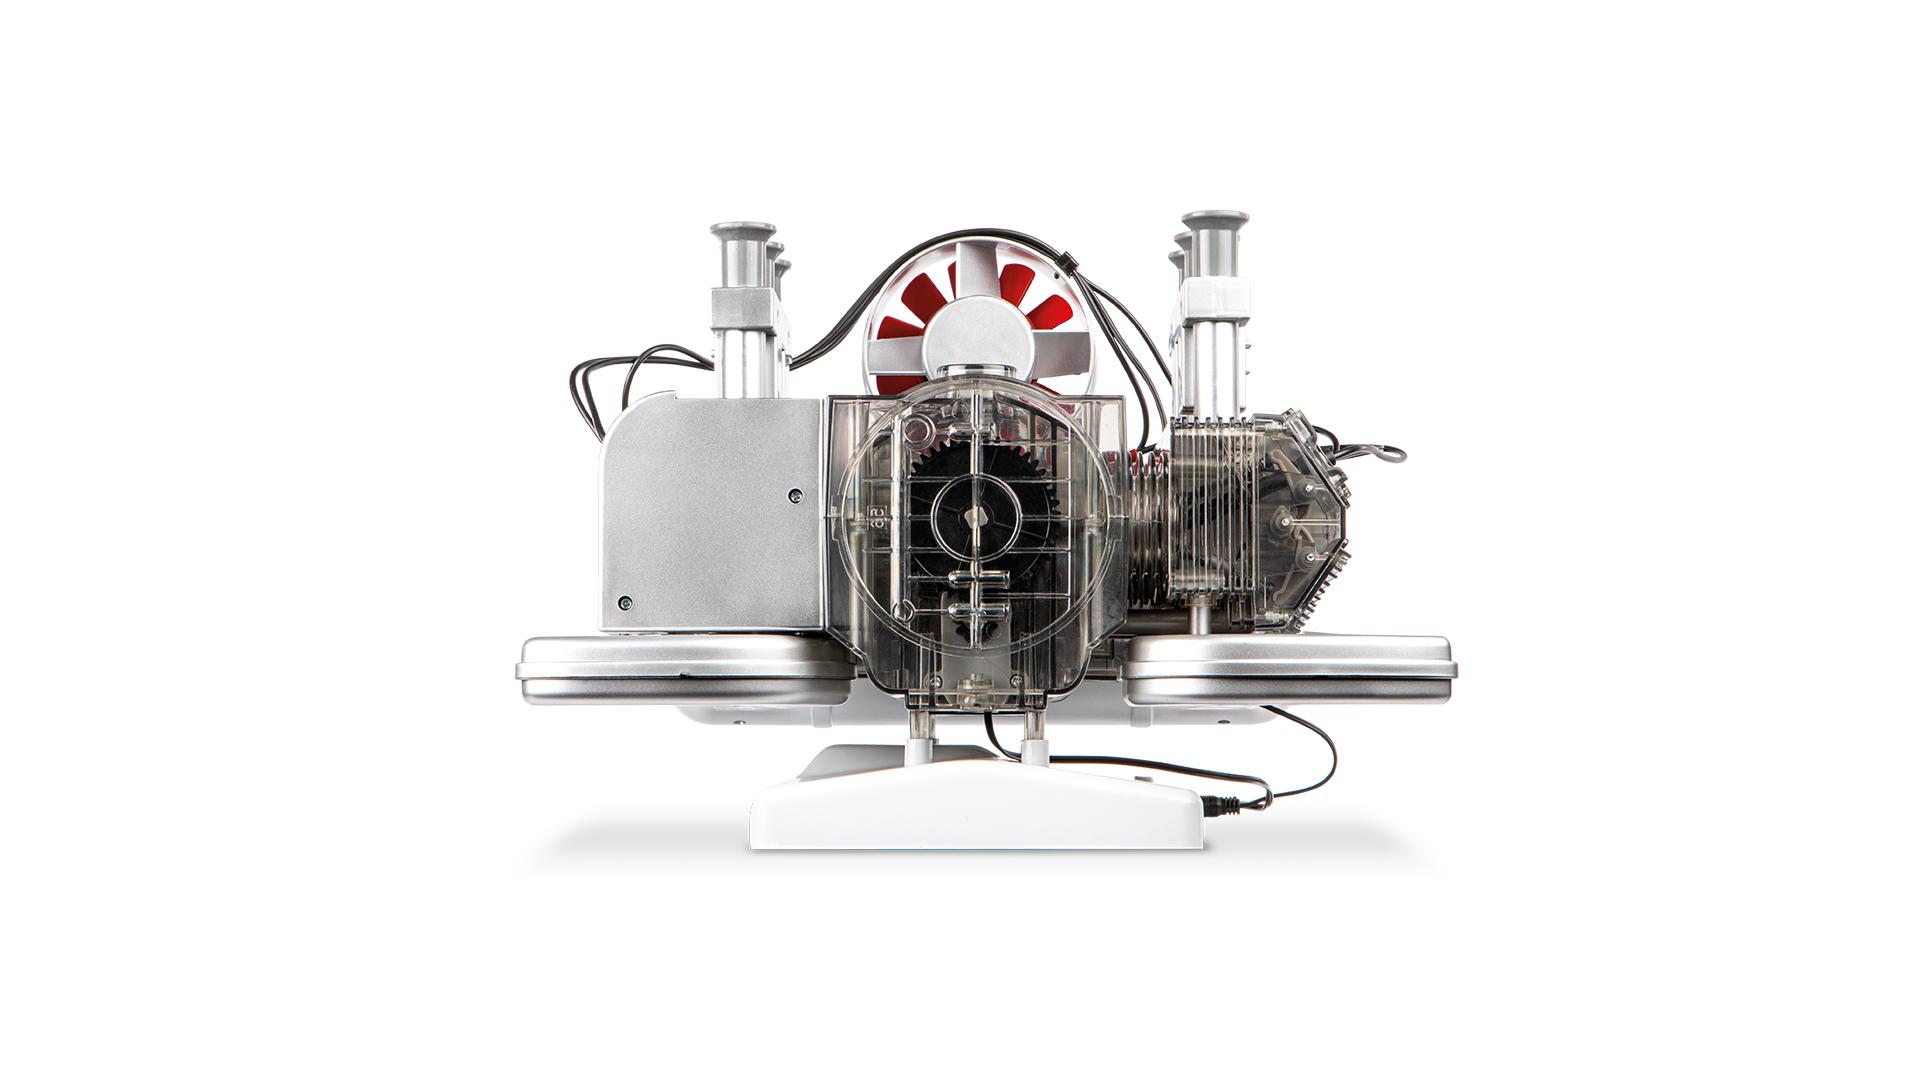 Elferspot competition Porsche 6-cylinder boxer engine kit